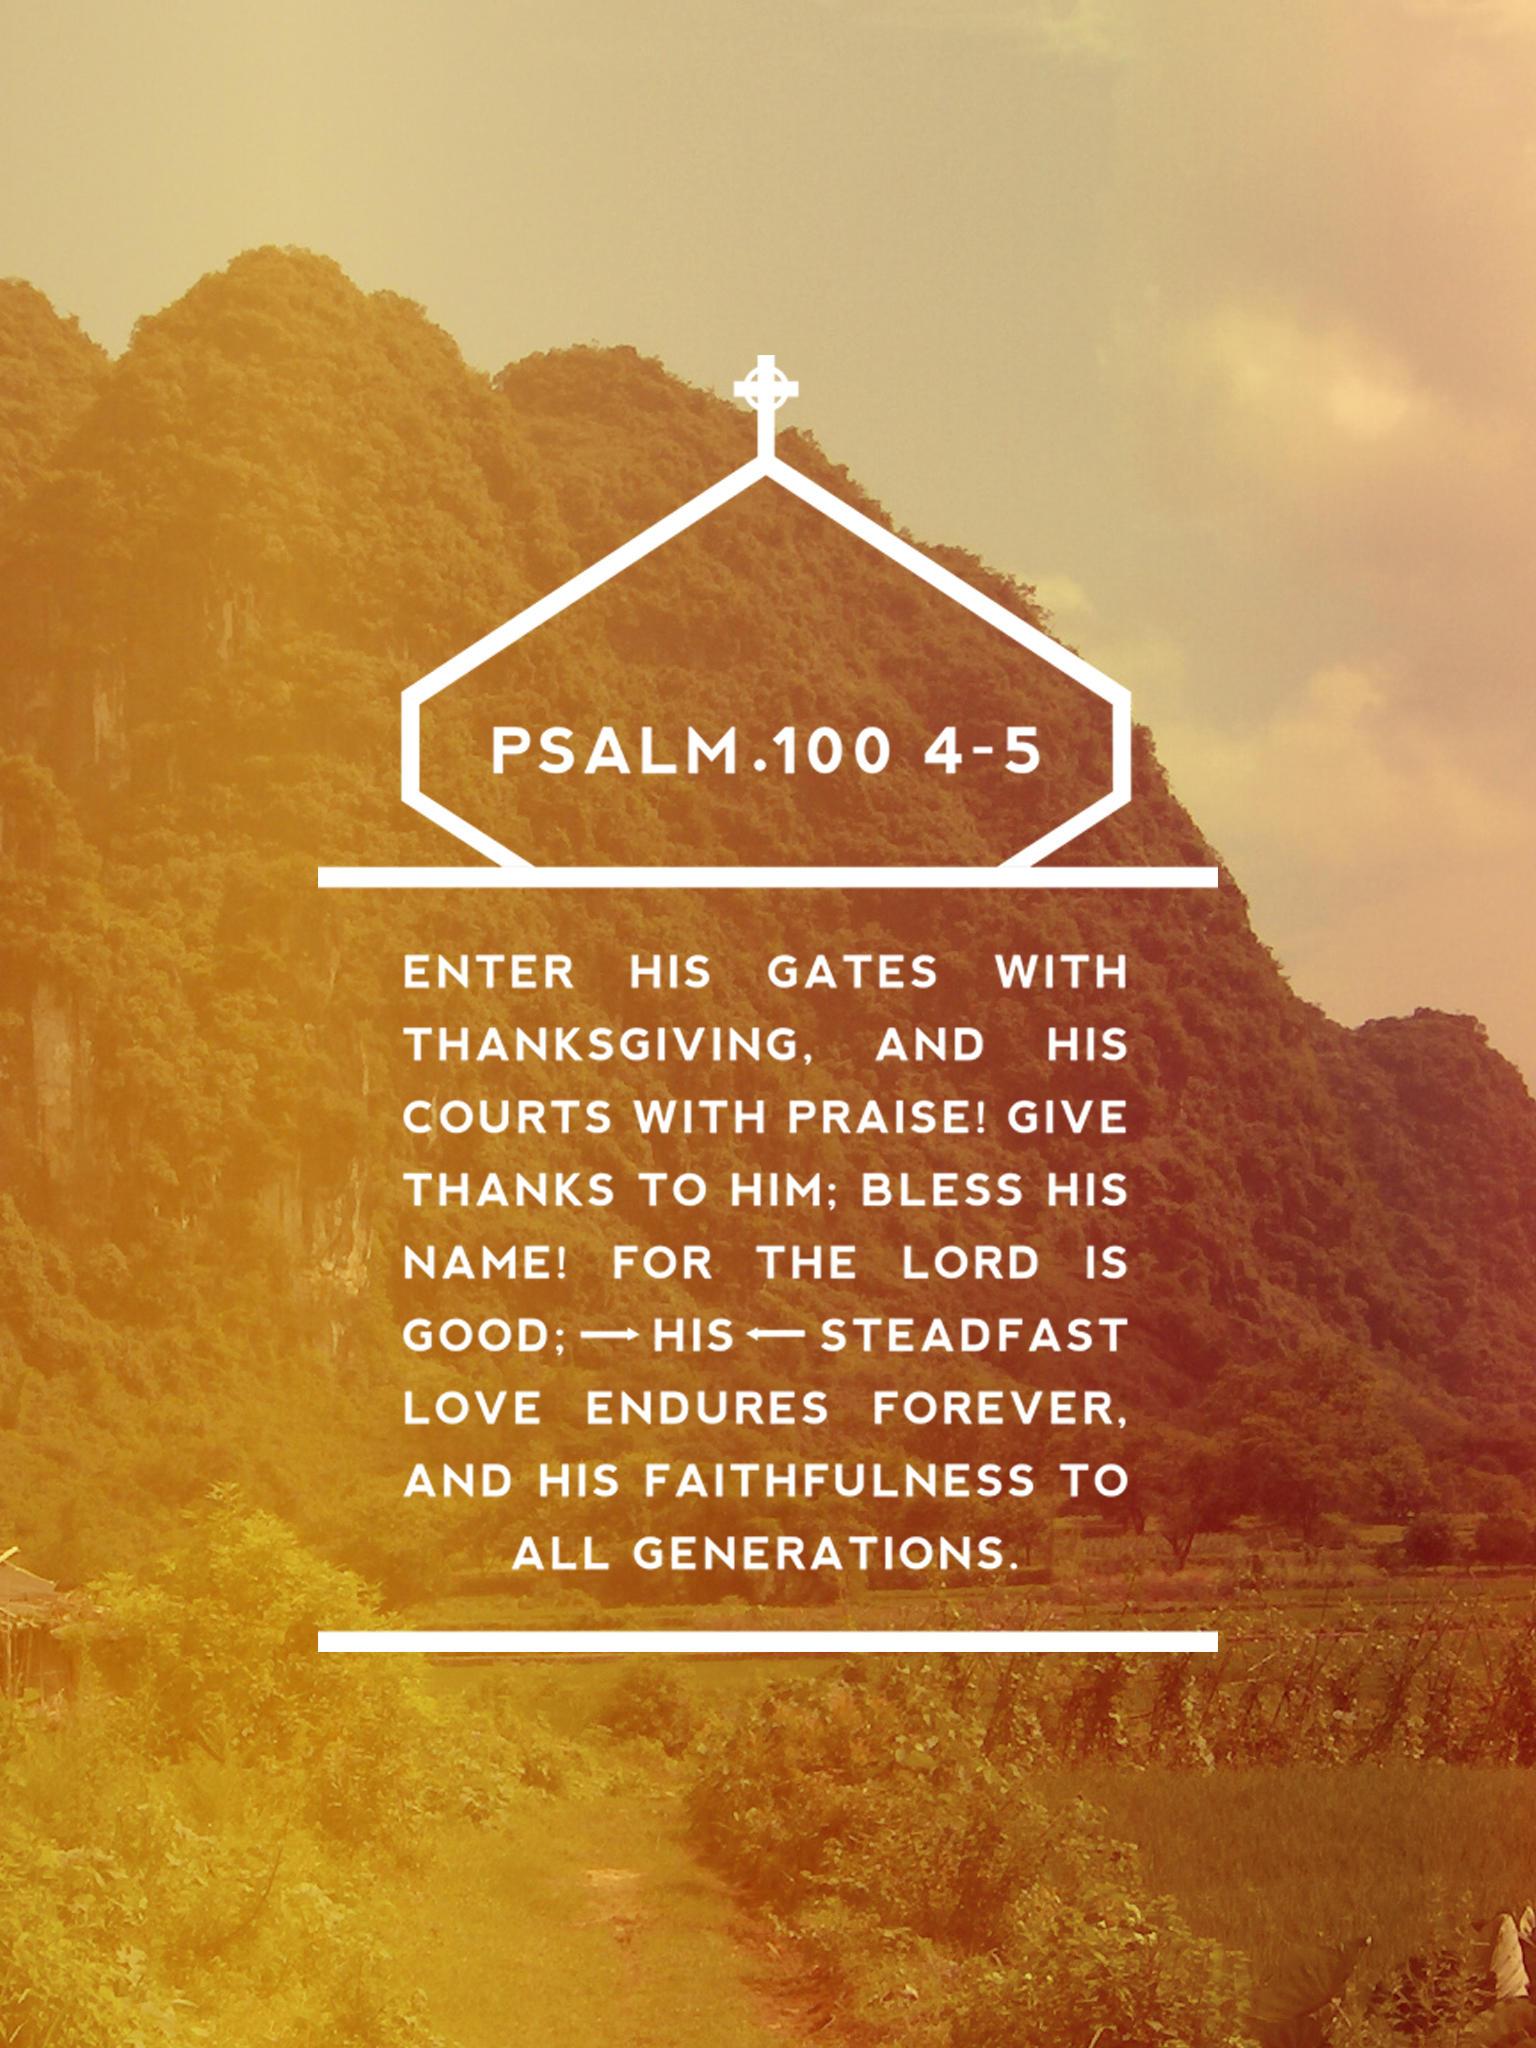 psalm-100-4-5_ipad_original.jpg